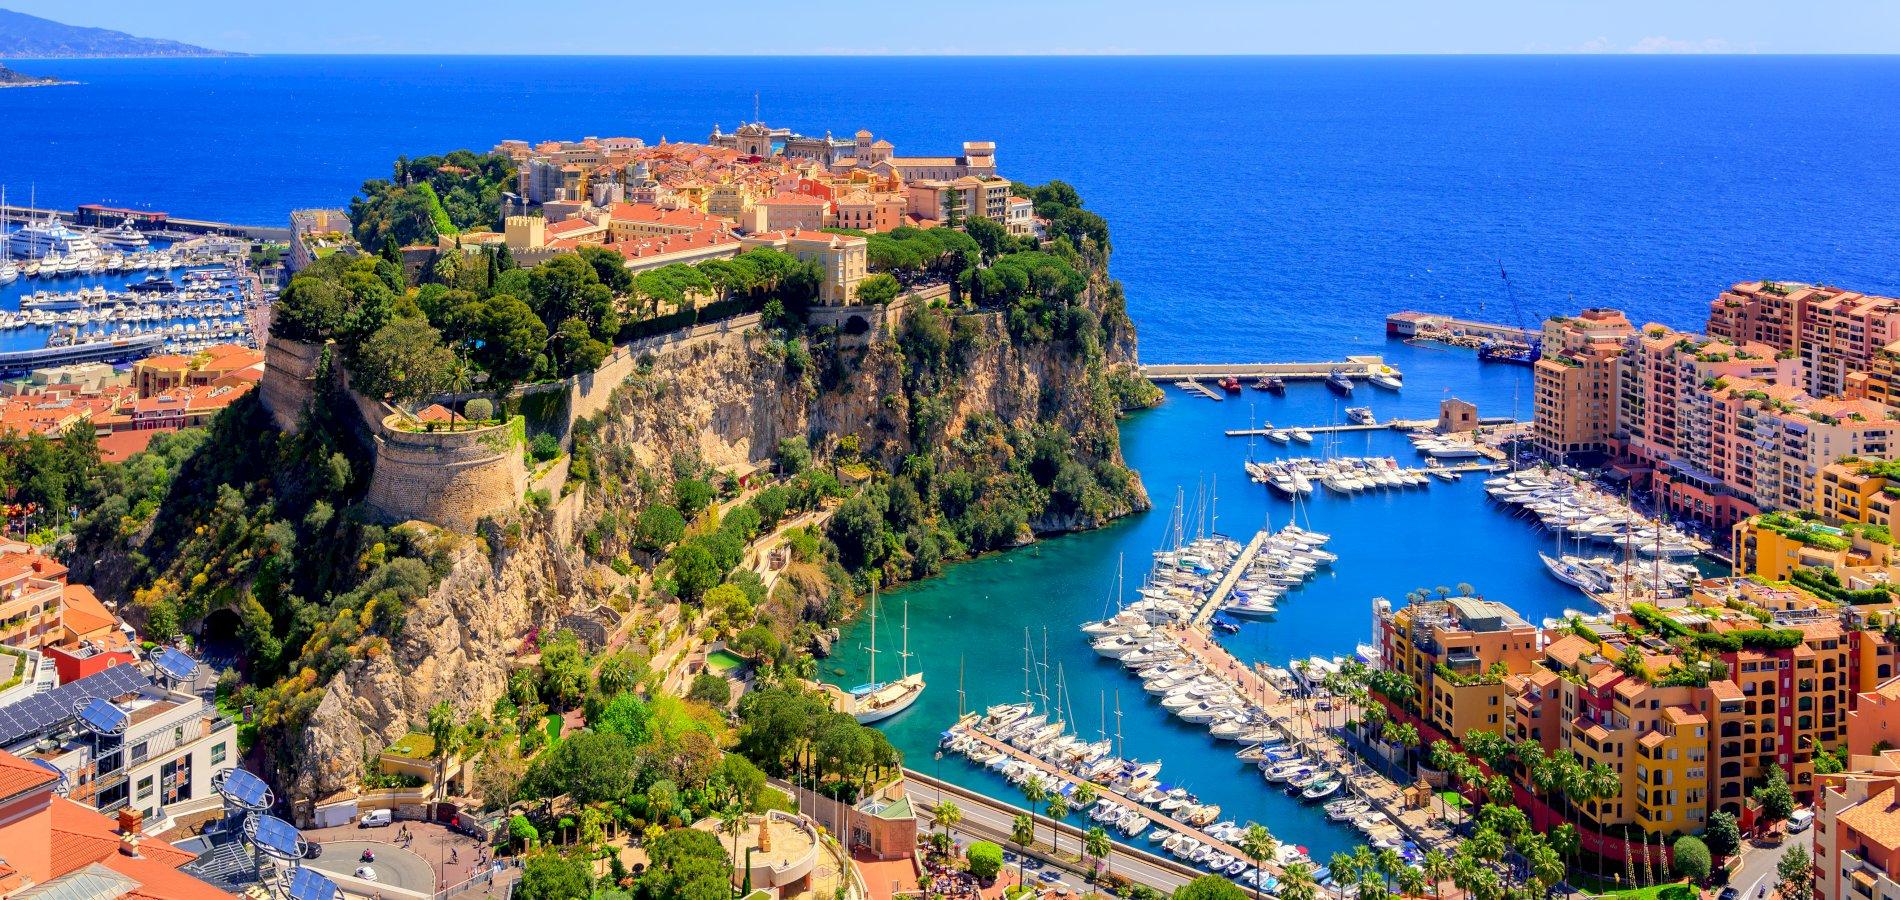 Ophorus Tours - Eze village, Monaco & Monte Carlo Shared Half Day Trip from Nice